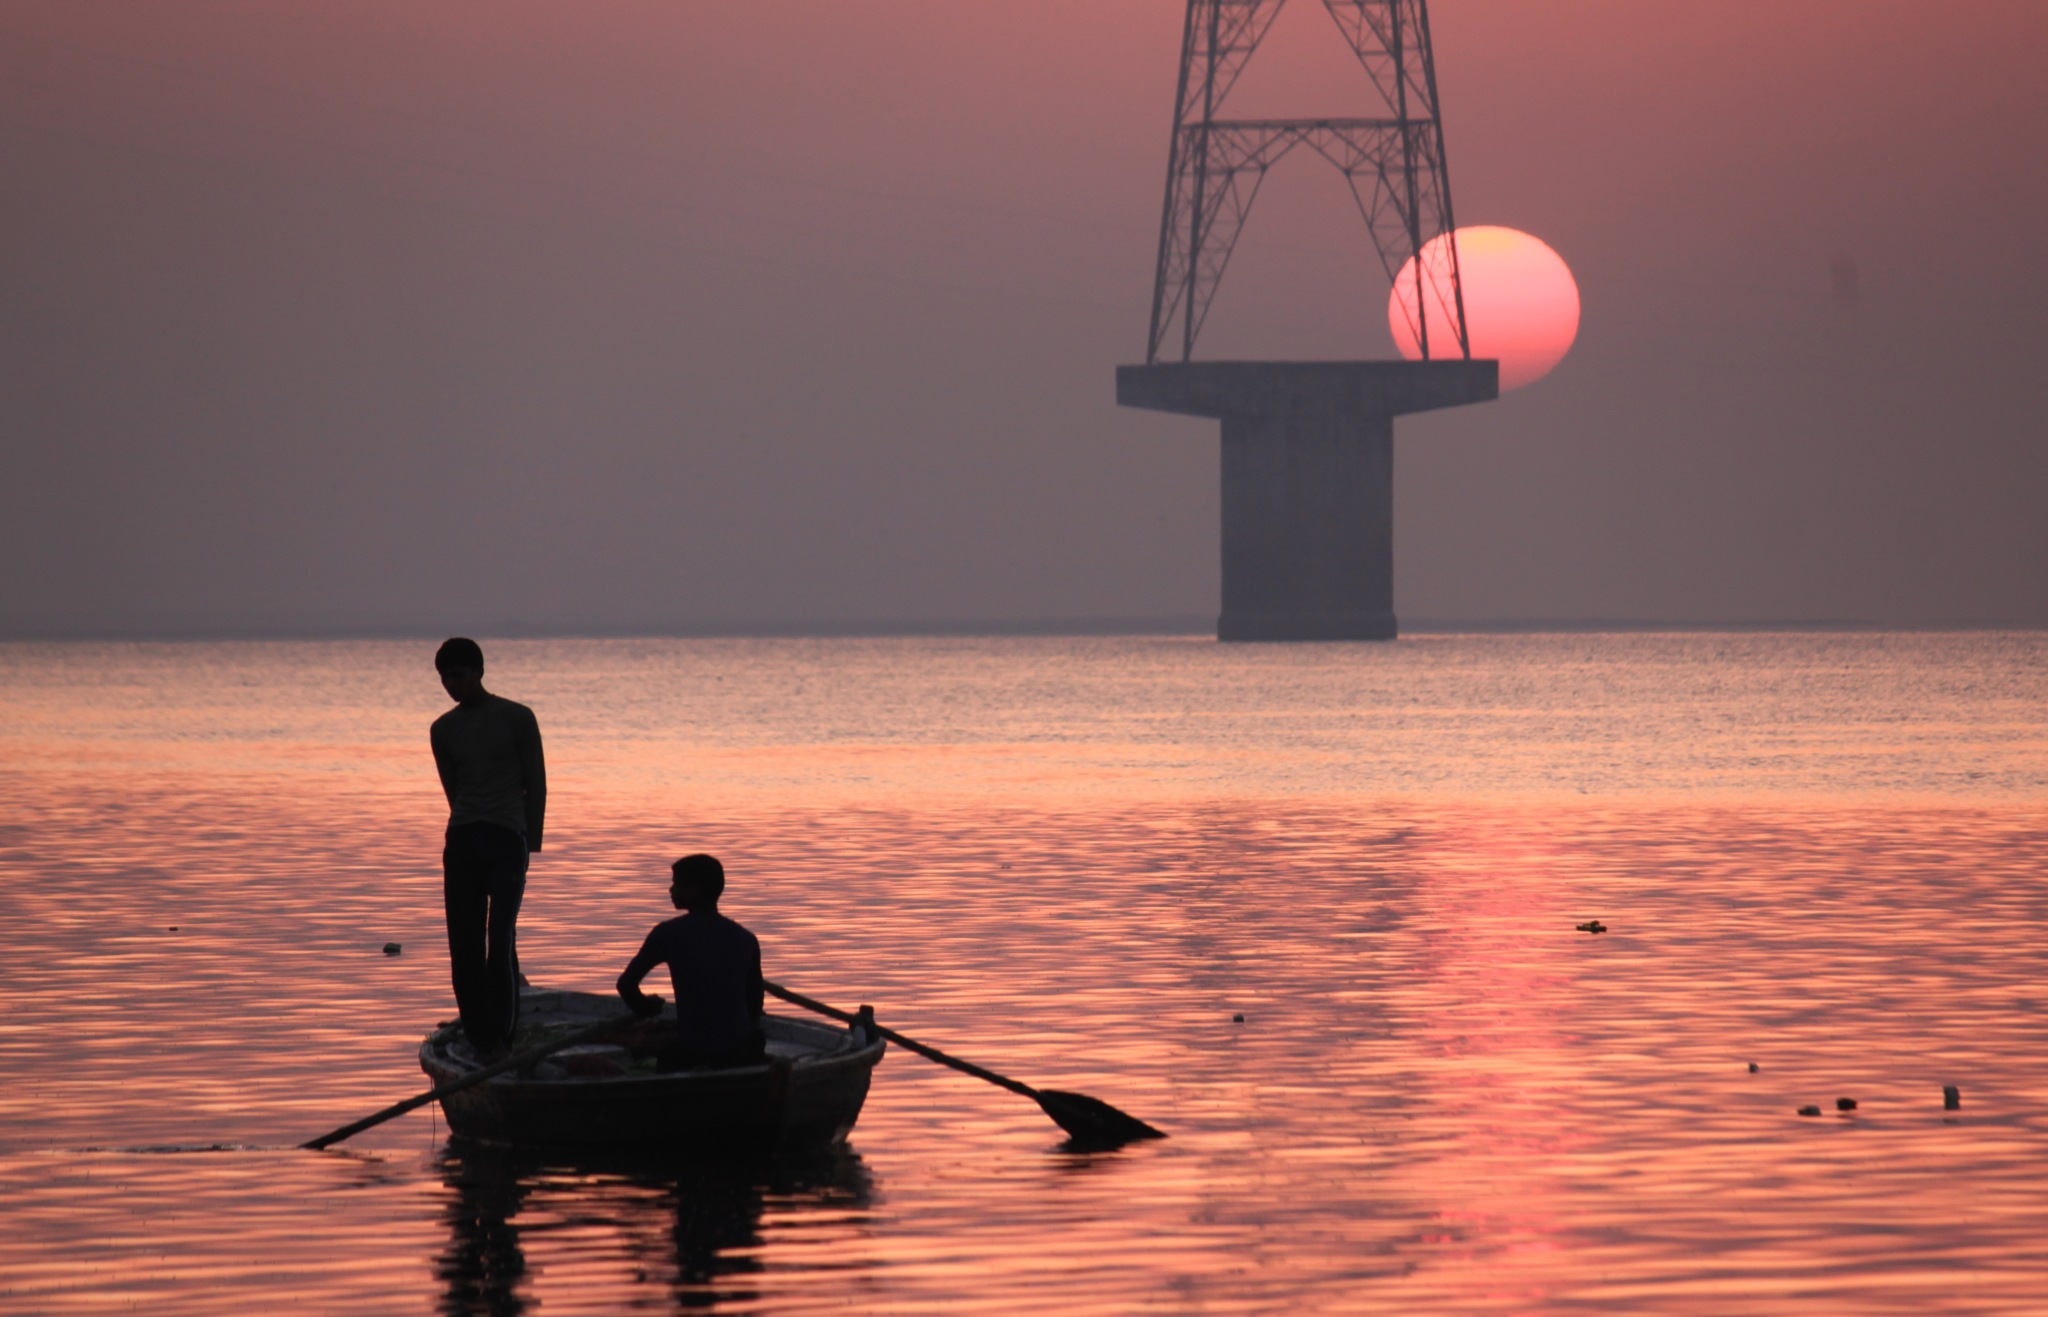 Sunrise by Sumit Gupta